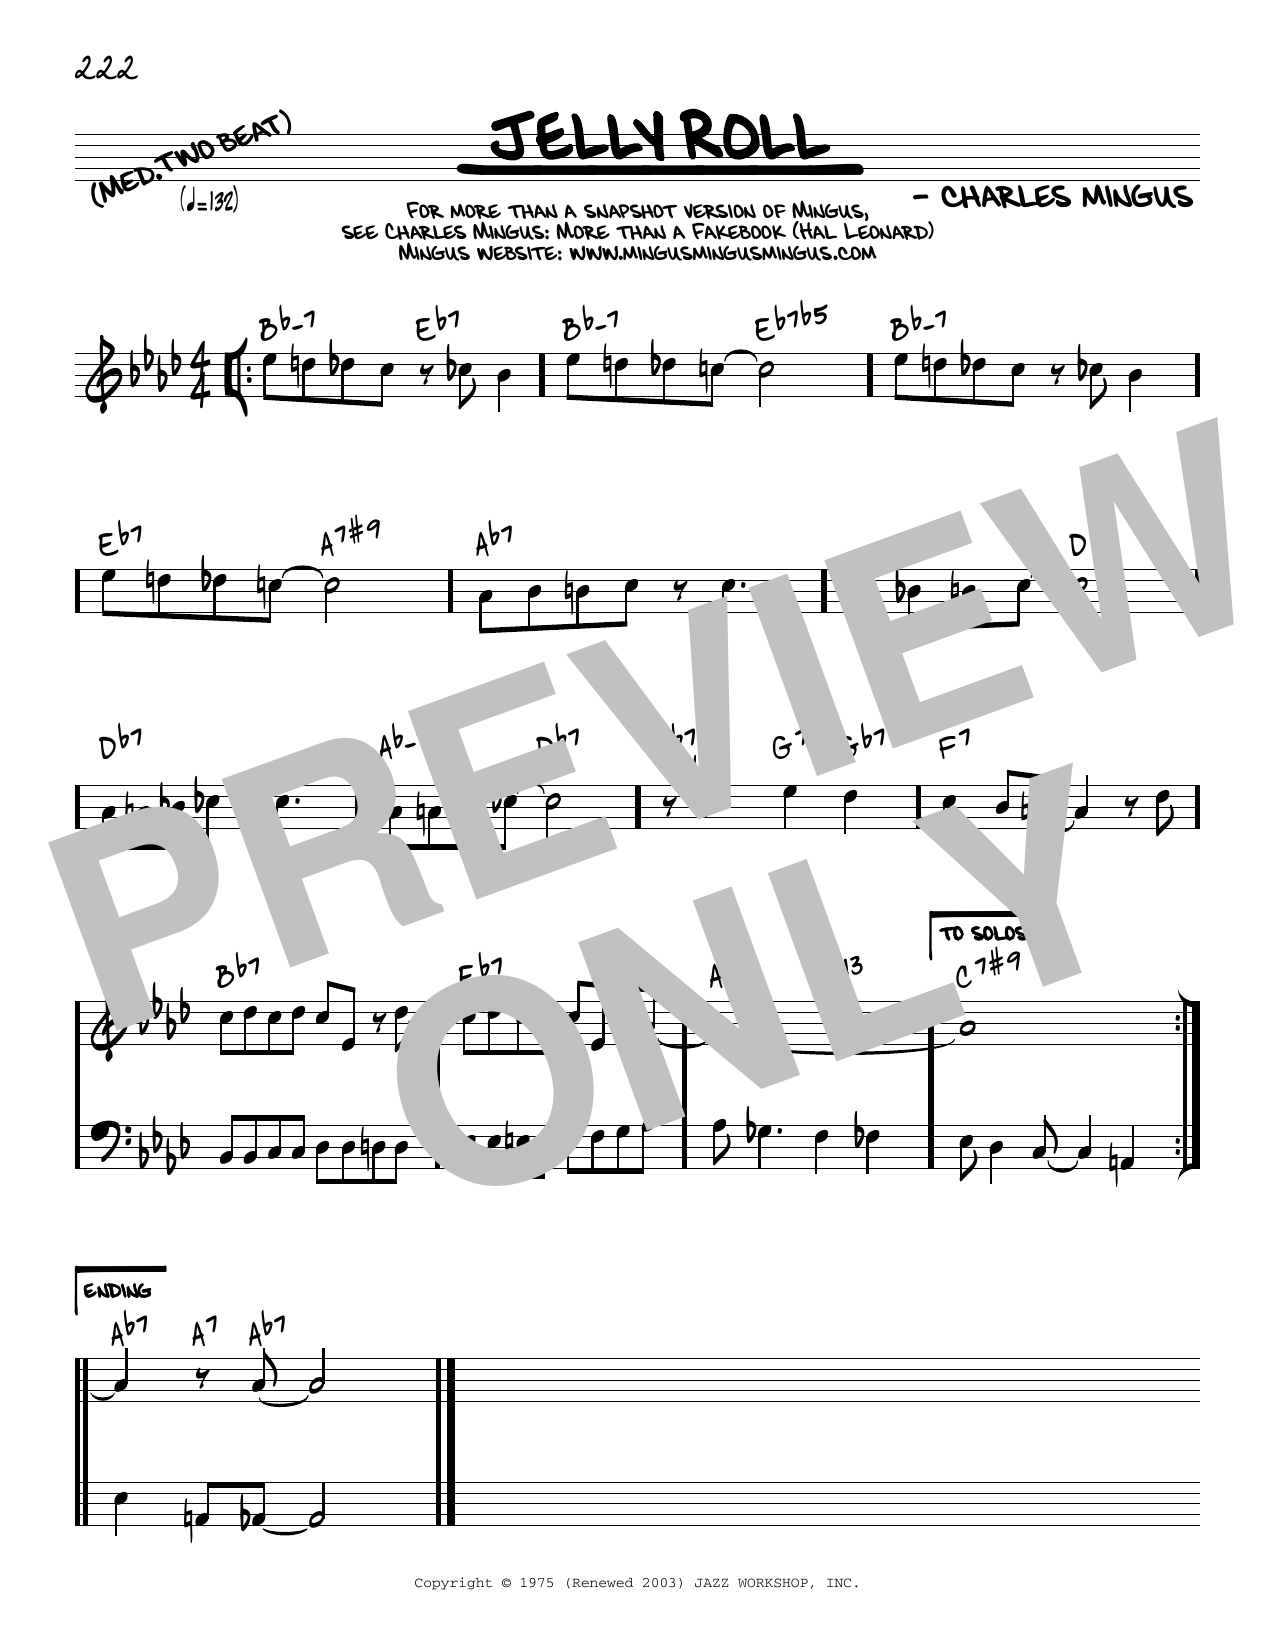 Charles Mingus Jelly Roll [Reharmonized version] (arr. Jack Grassel) sheet music notes printable PDF score